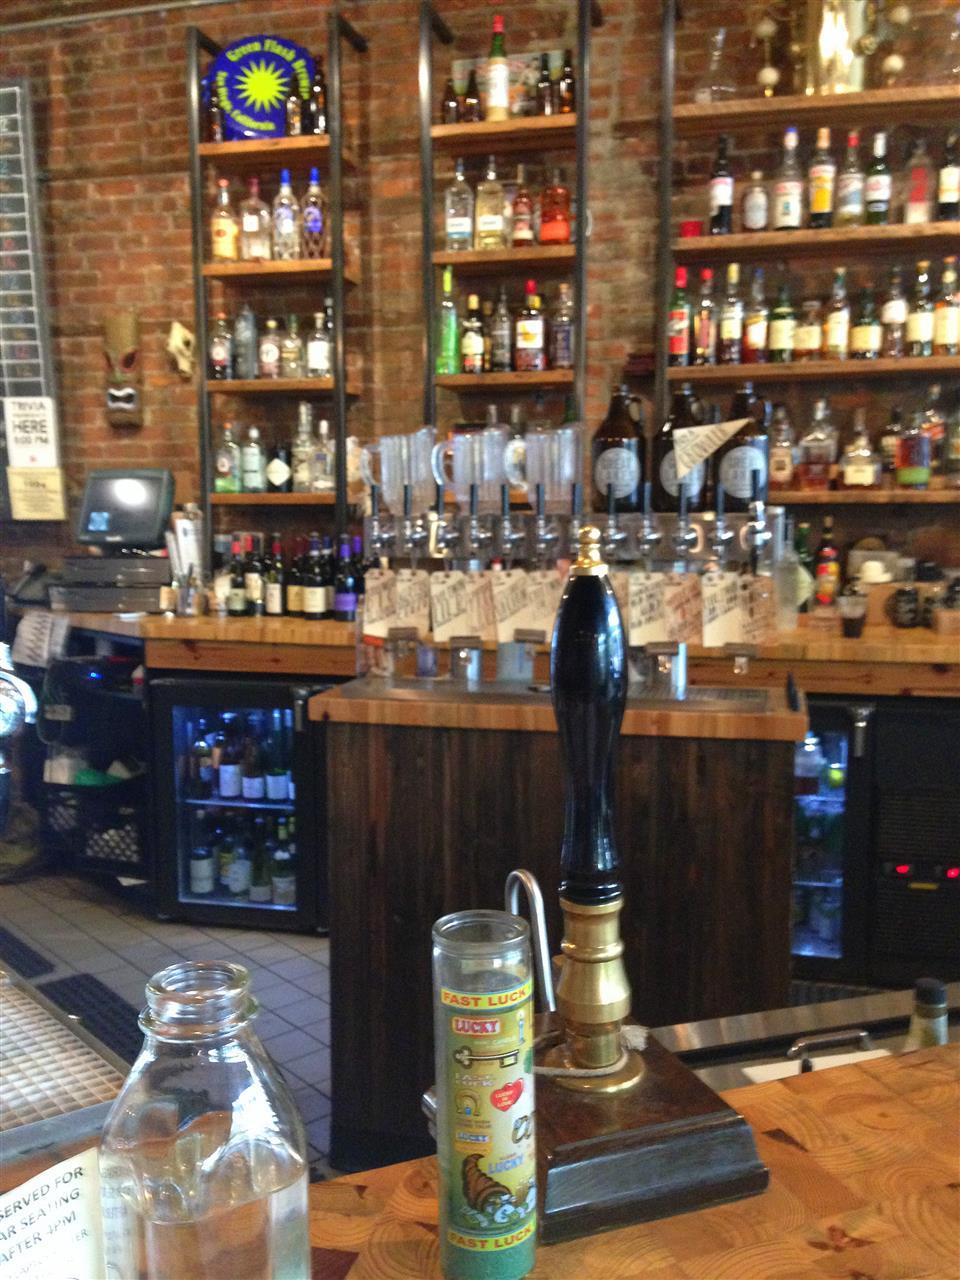 Interior of Great Lakes Coffee, a Midtown coffee bar ~ Detroit, Michigan #LeadingRElocal #Detroit #Michigan